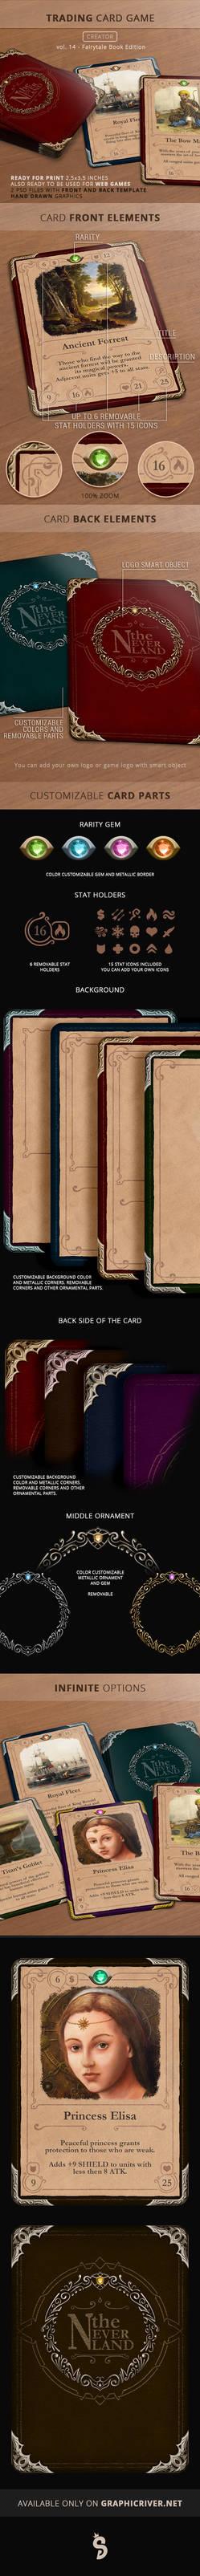 Trading Card Game Creator - 14 - Fairytale Book